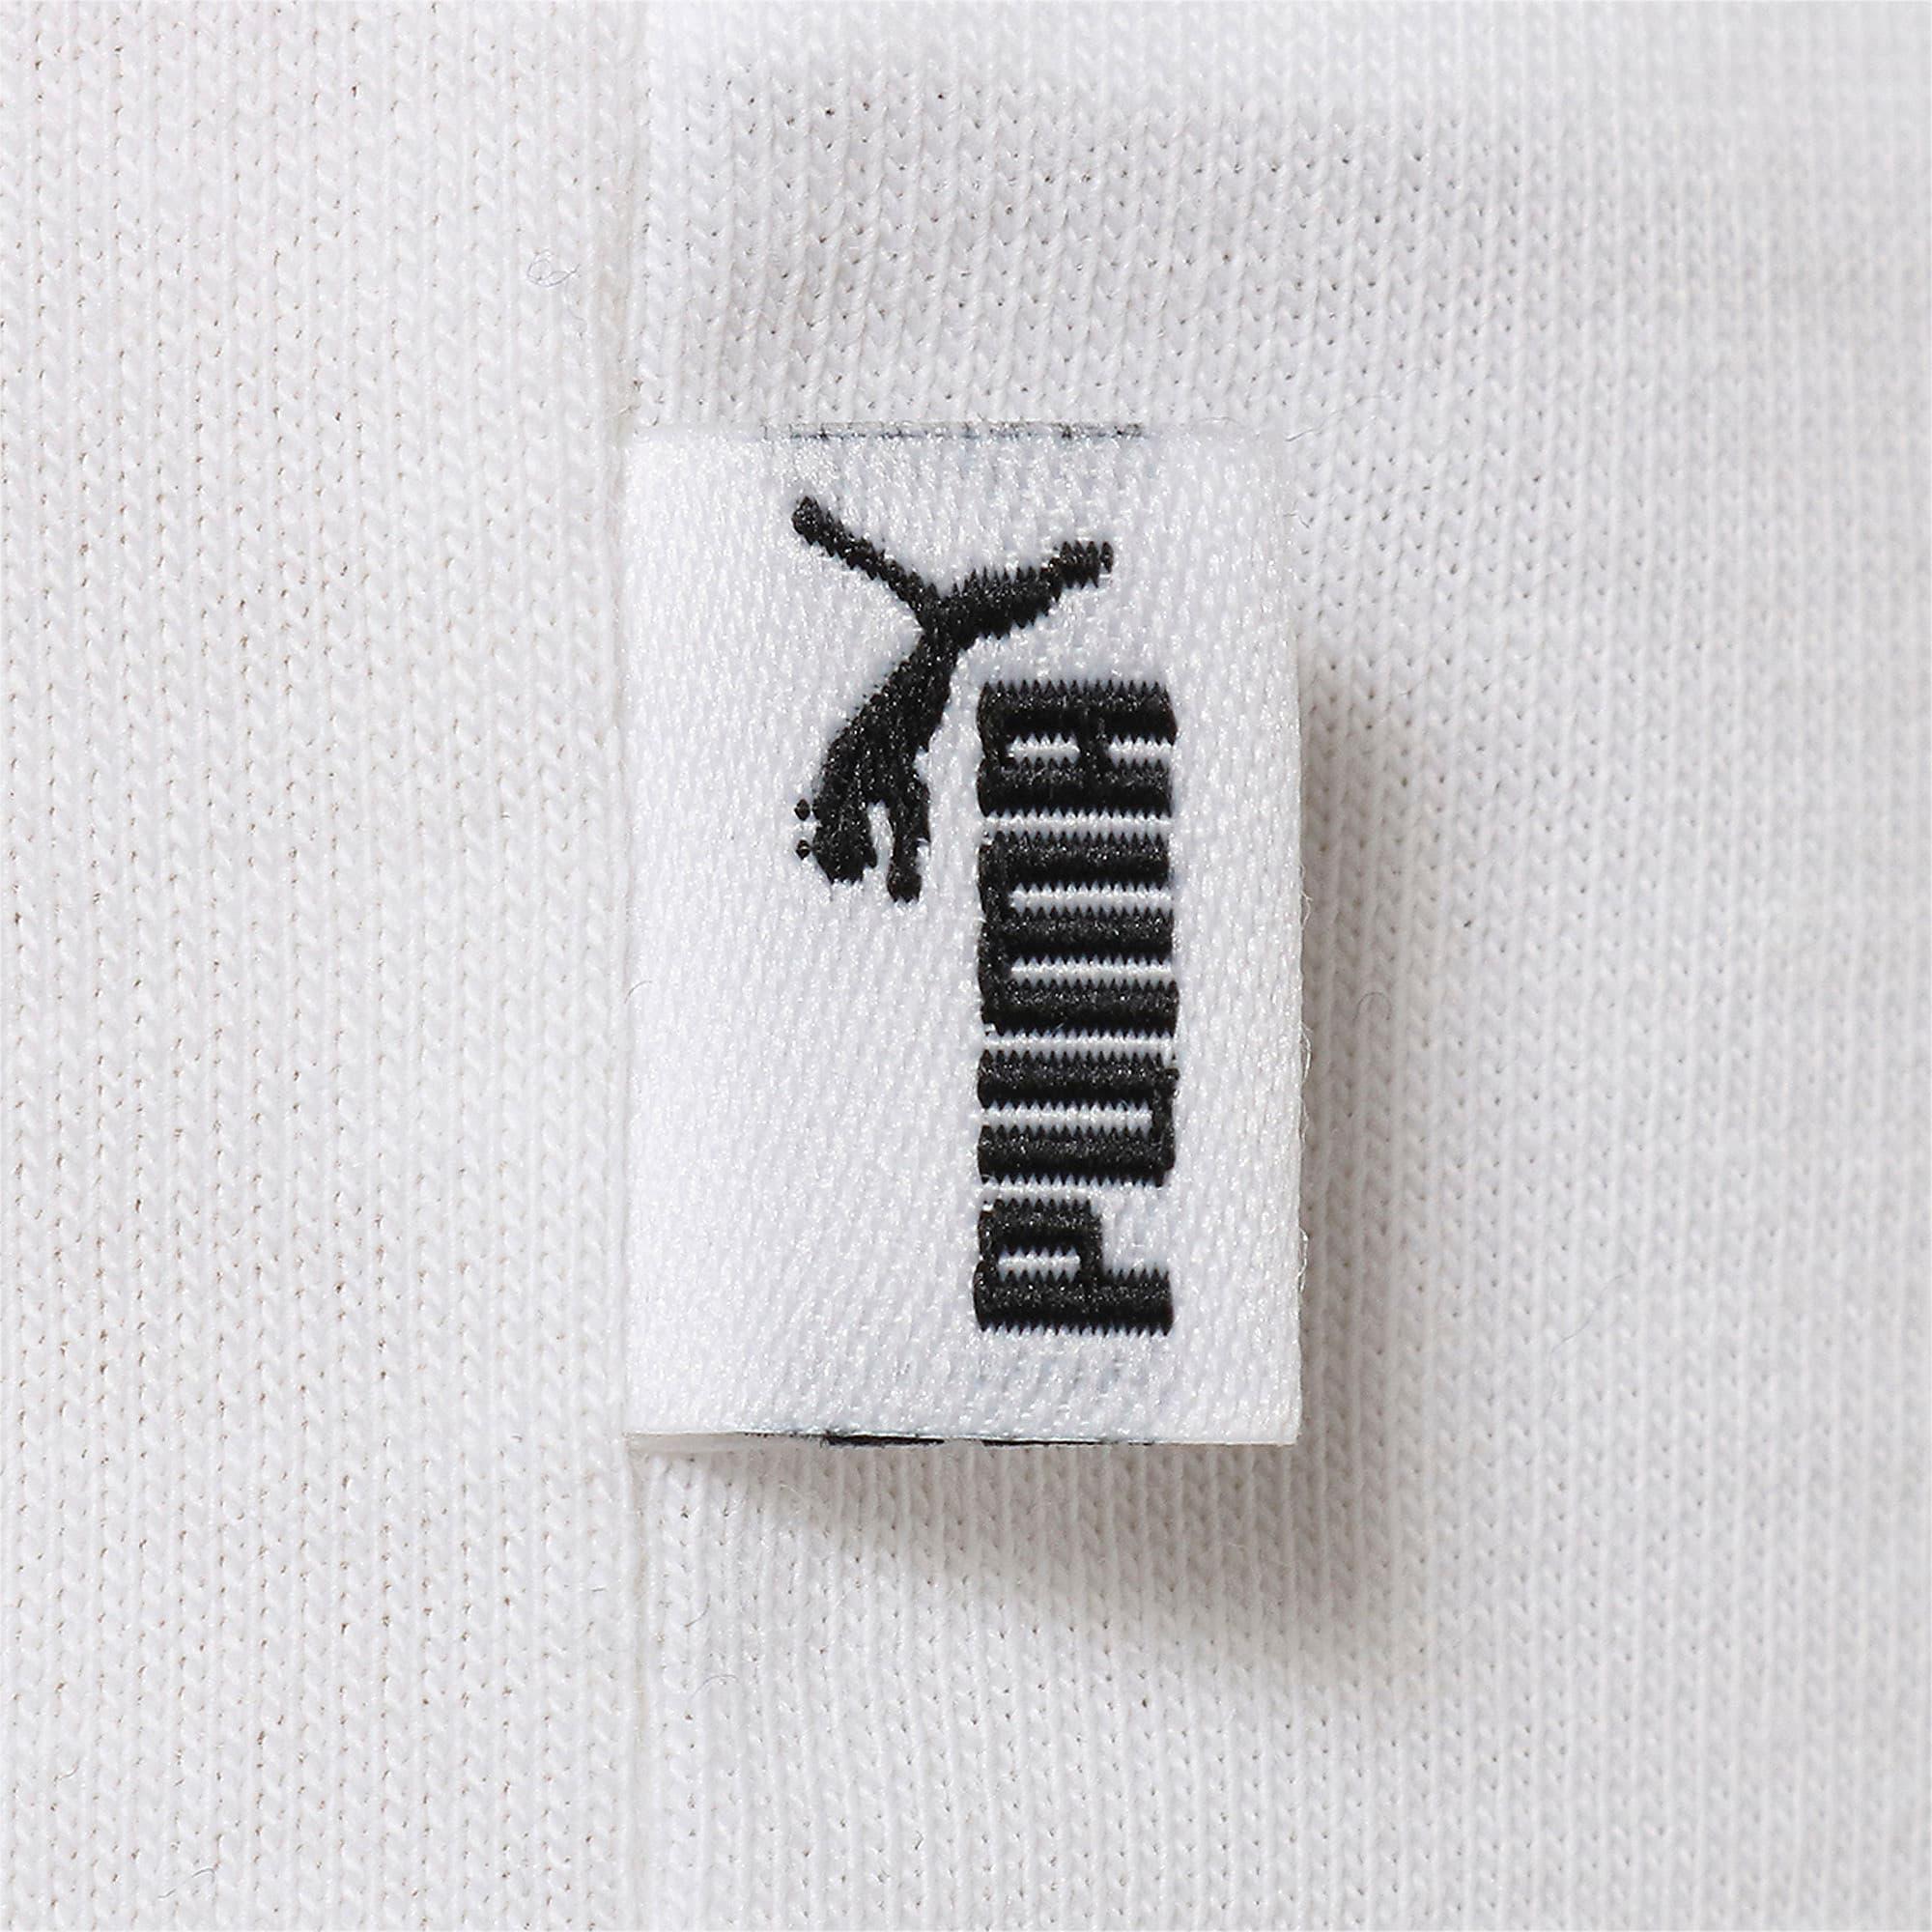 Thumbnail 8 of キッズ シティー 半袖 Tシャツ 2 OSAKA 大阪, Puma White, medium-JPN